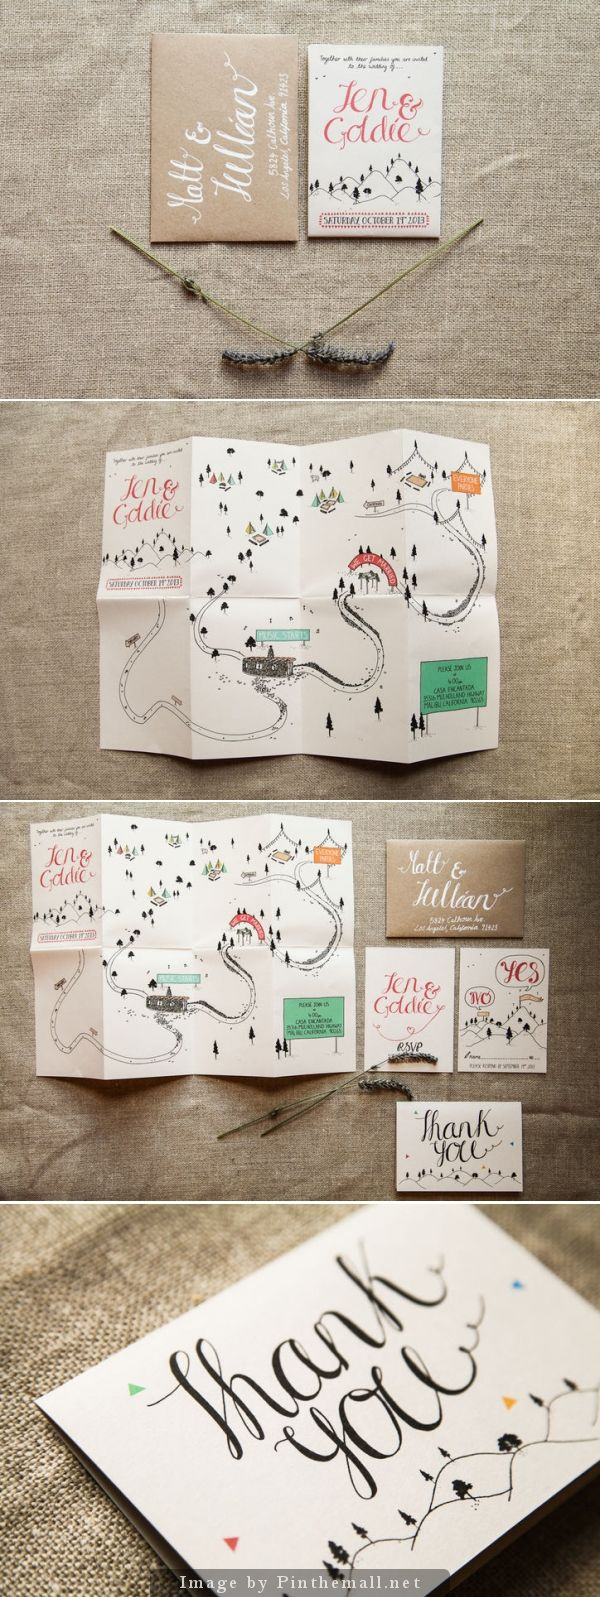 The Invitations Map Wedding Invitation Hand Drawn Wedding Invitations Creative Wedding Invitations